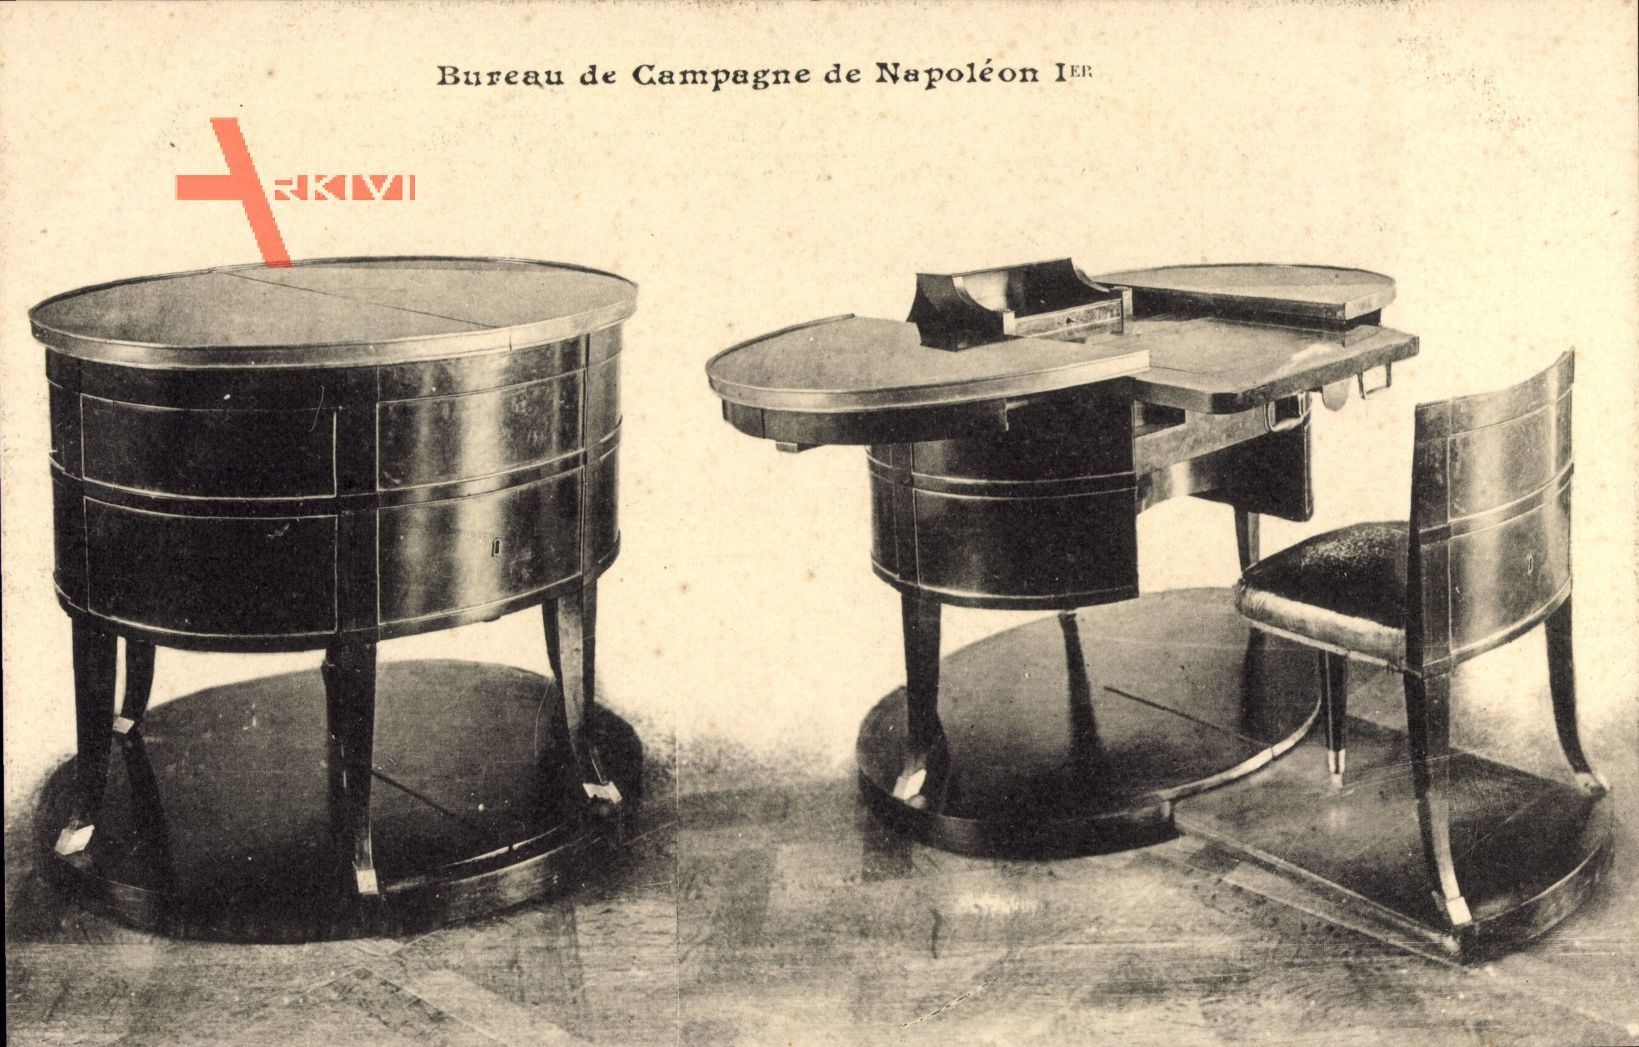 Bureau de Campagne de Napoleon Ier, Möbel